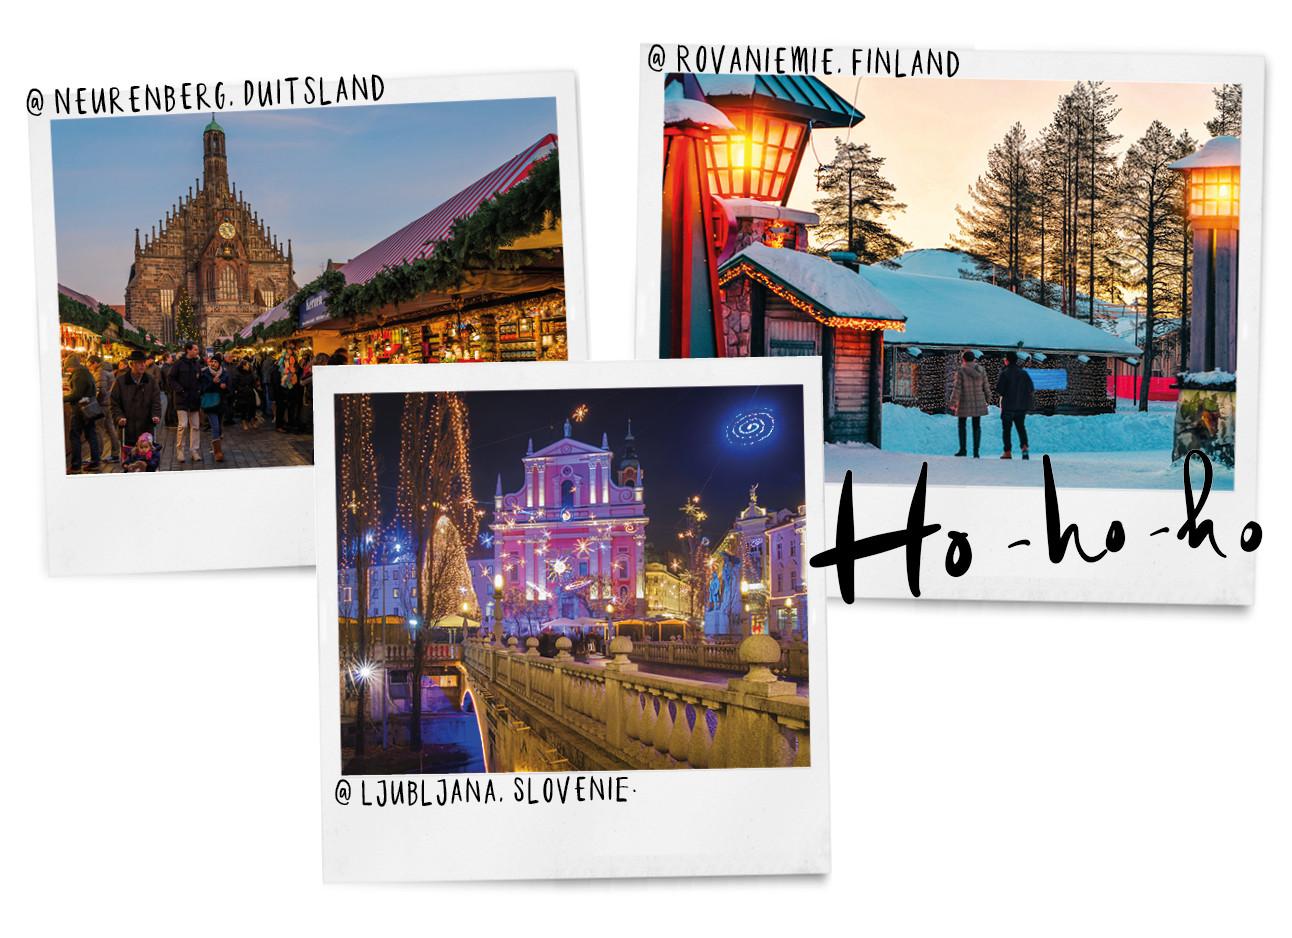 kerstmarkten in duitsland roemenie en slovenie